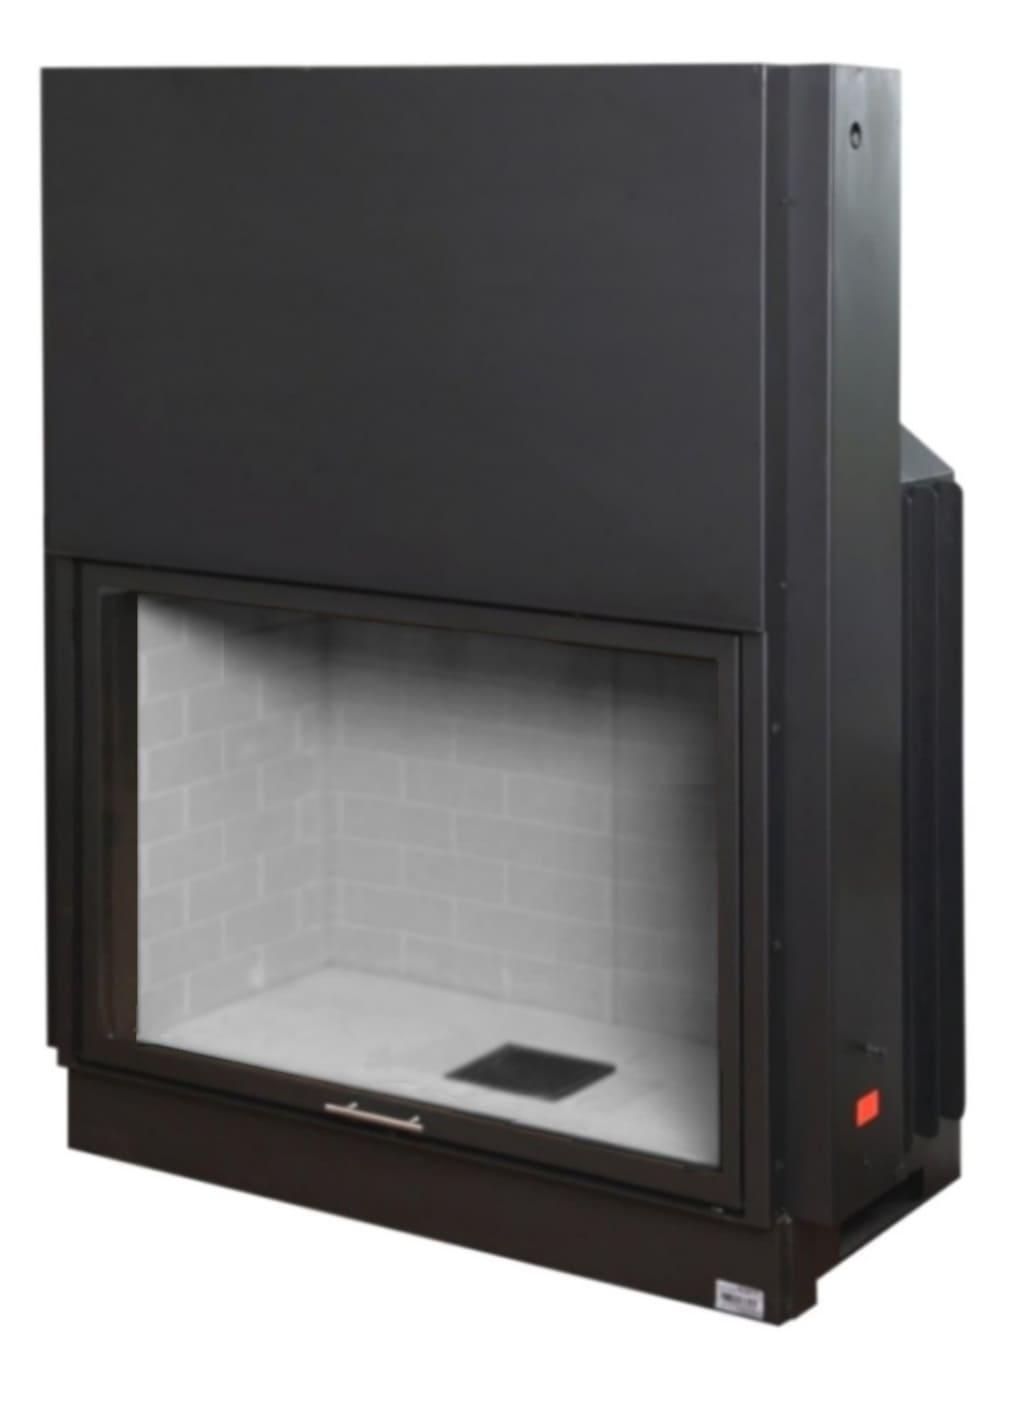 Varia Bh 120x80 (Prestige)